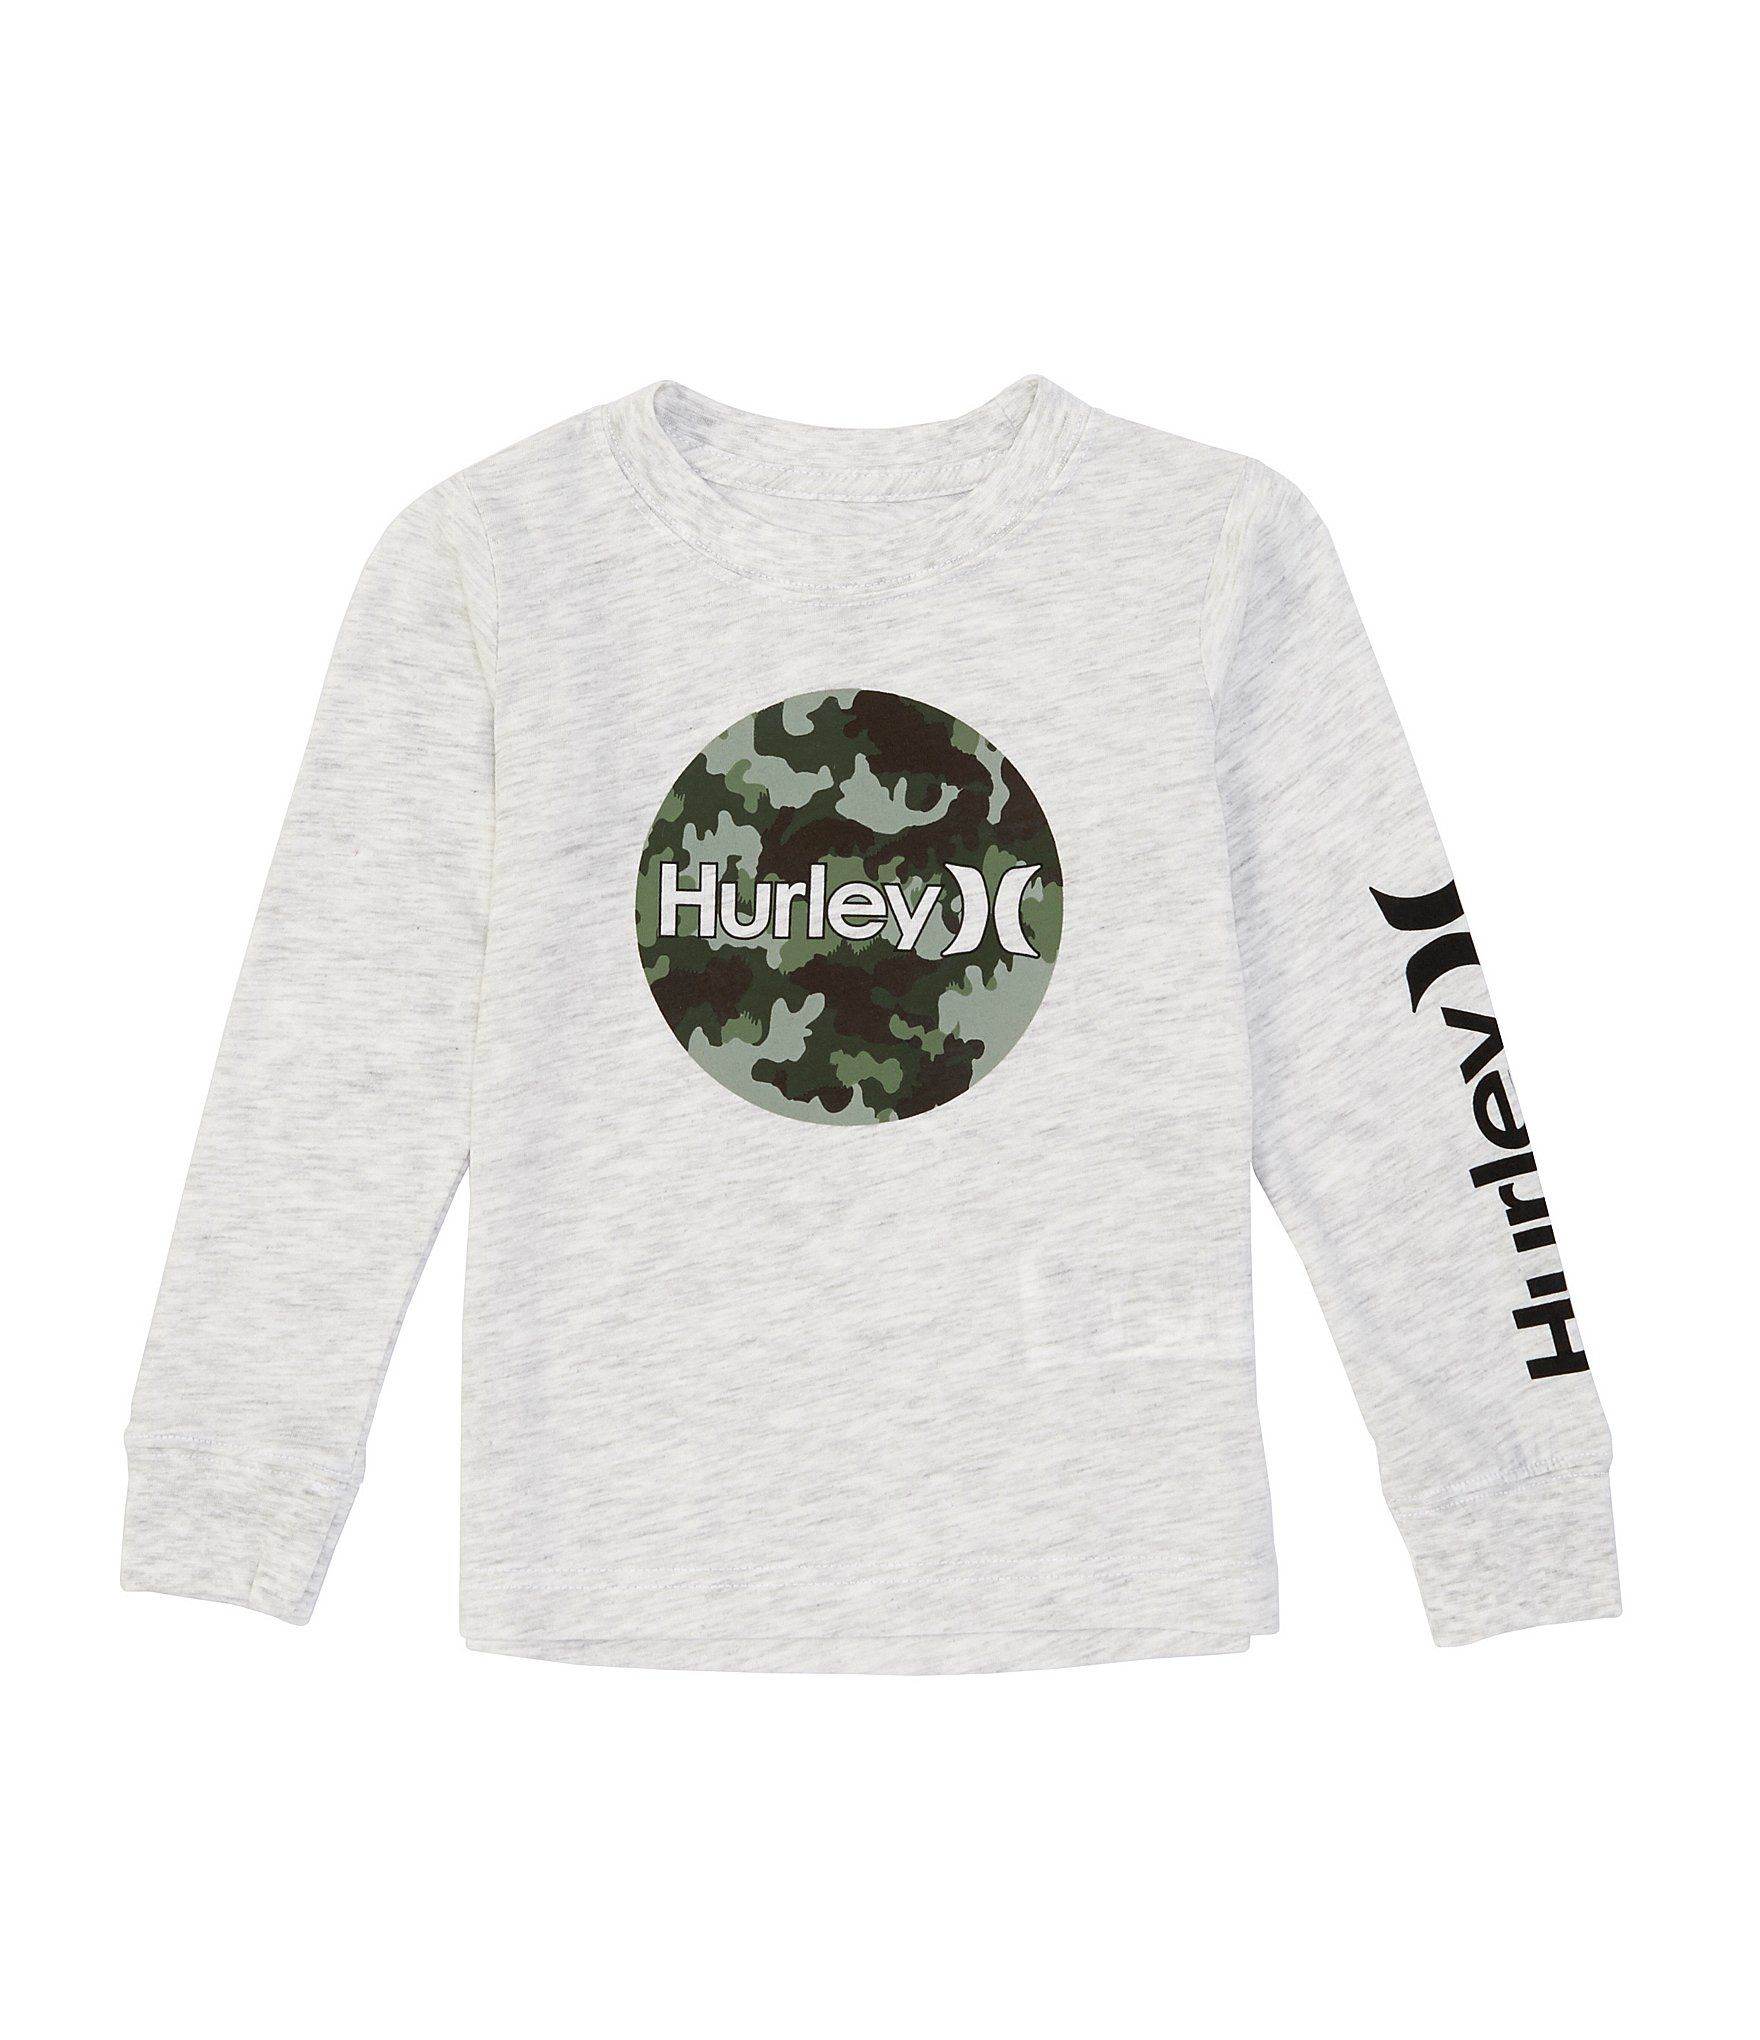 Hurley Boys Circular Print Fill Long Sleeve Top Long Sleeve Tops